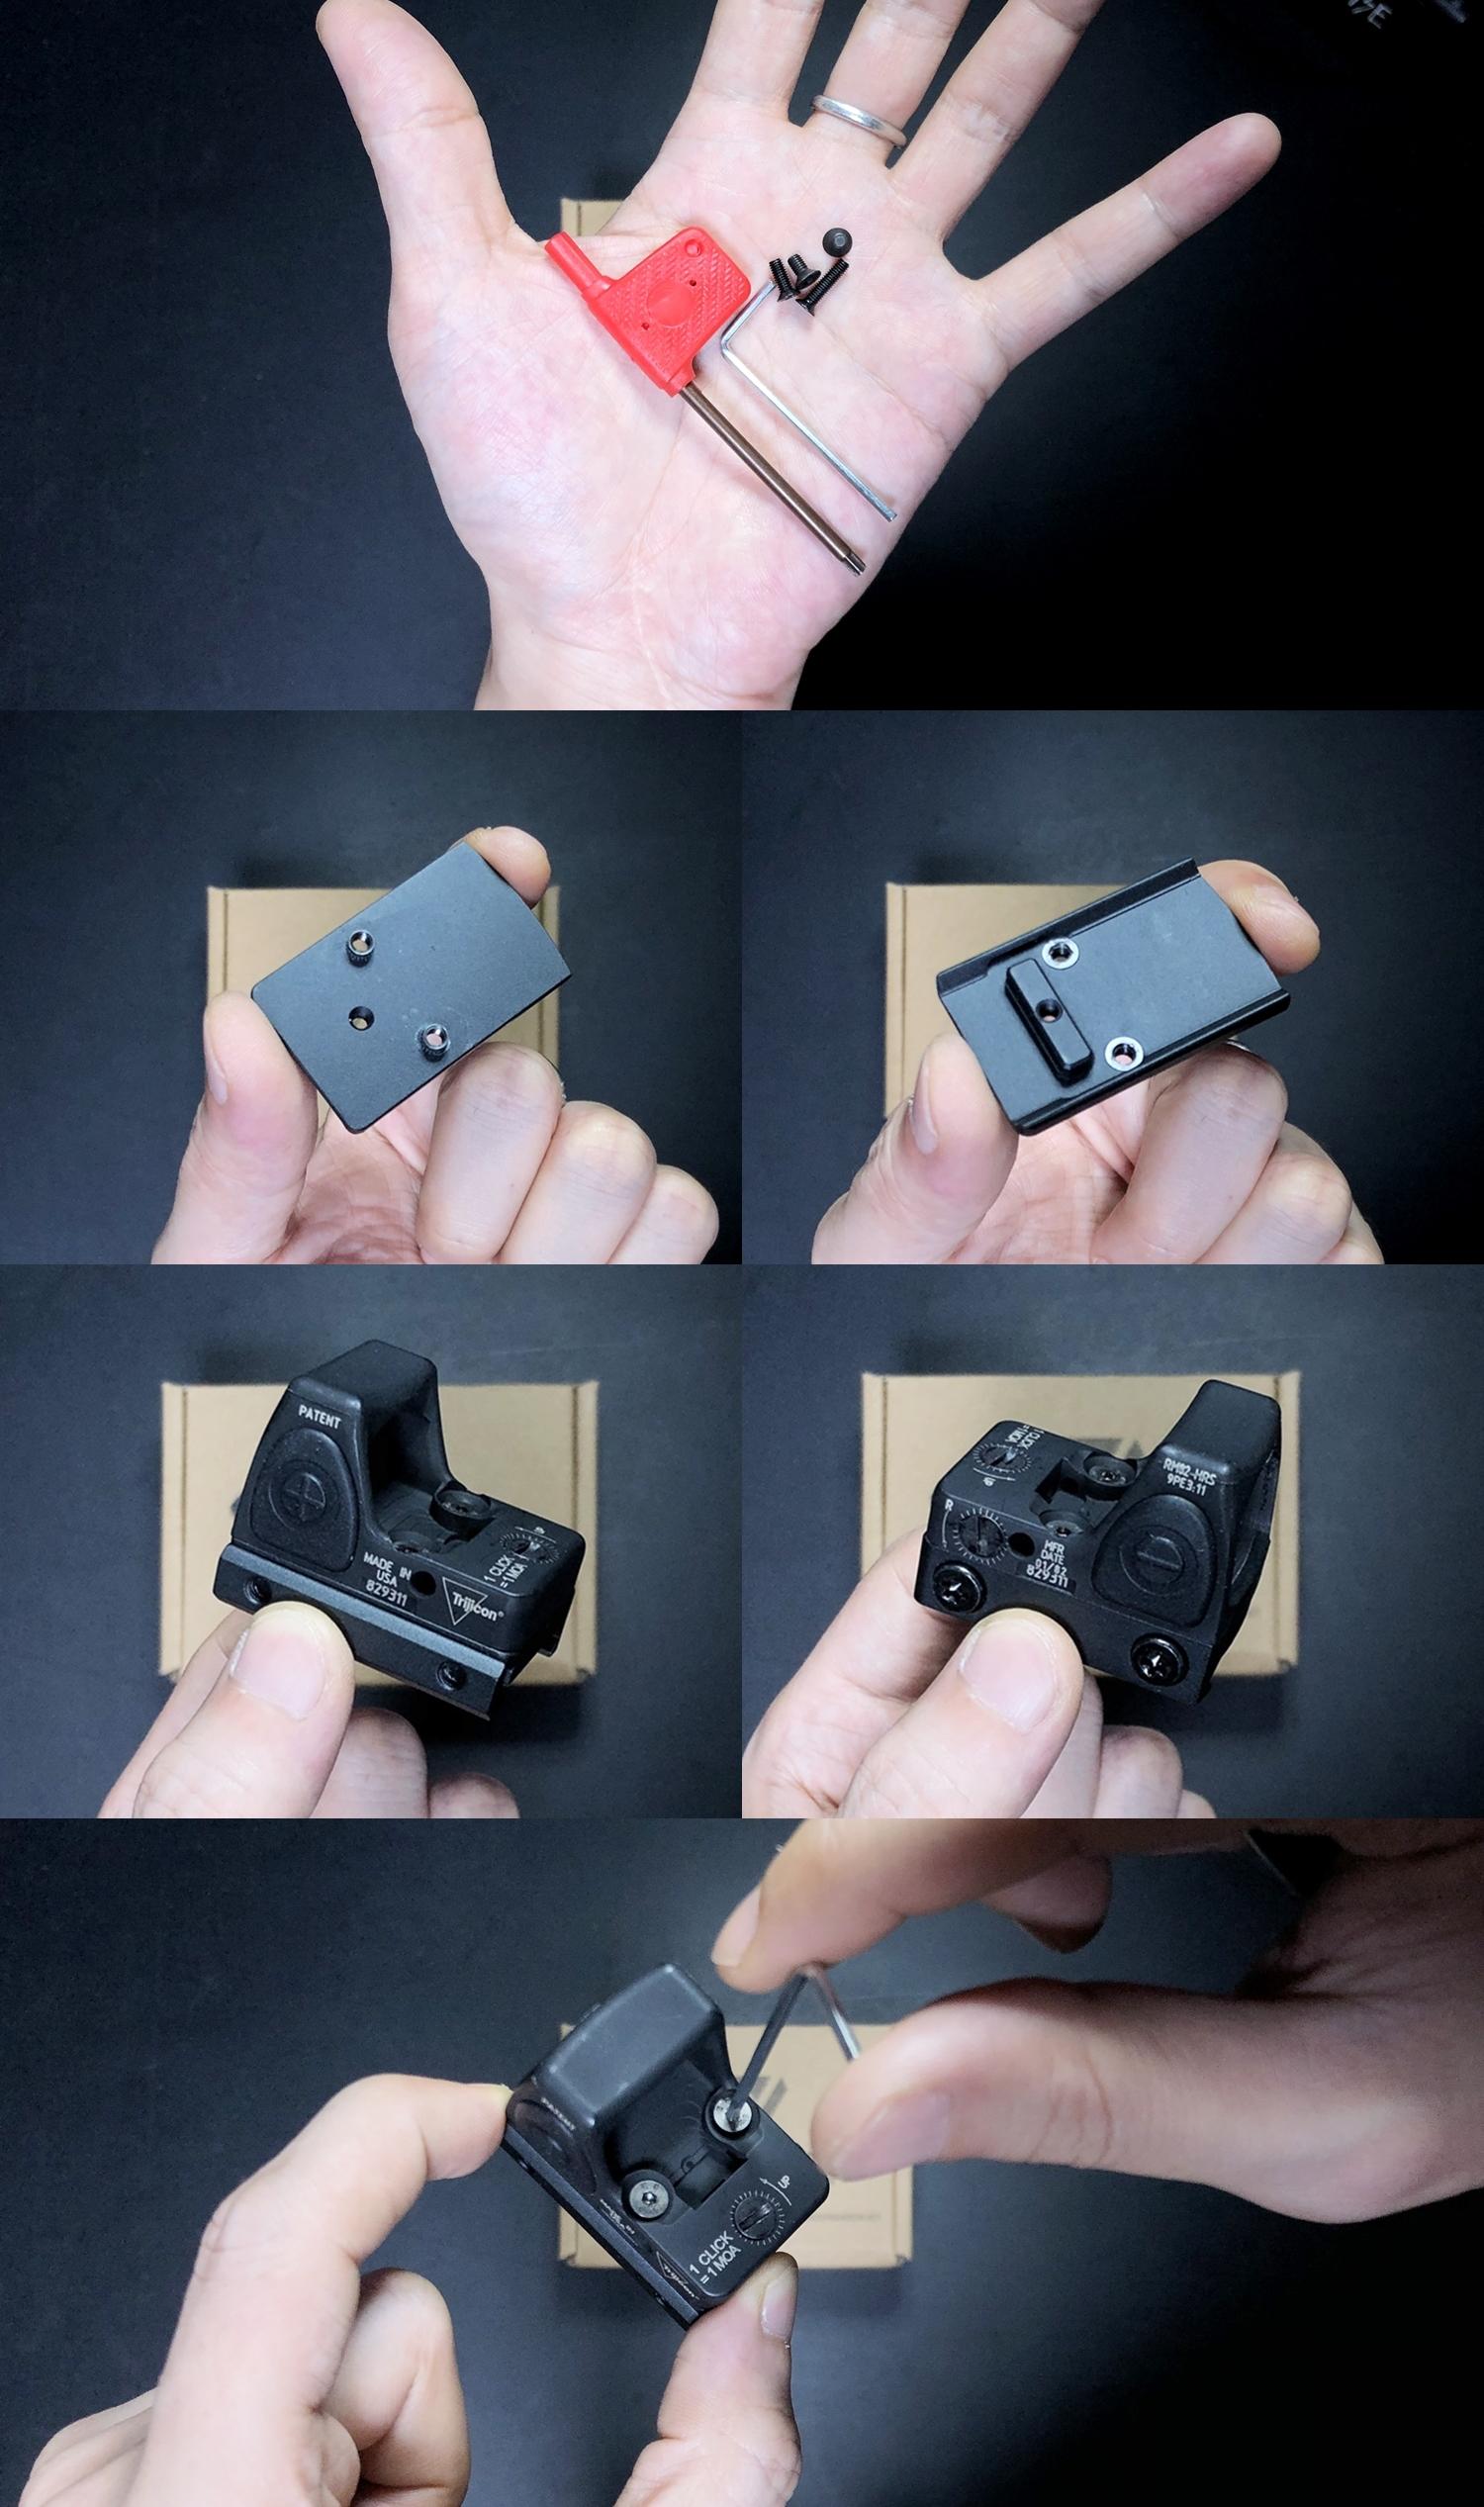 2 HolyWarrior製 RMR Trijicon Type ドットサイト GET!! 噂のHW製 最新 超軽量 複合材質 樹脂 タイプを購入したけど速攻で仲間に奪われました(笑)!! Glock G17 GBB カスタム!! 購入 開封 取付 加工 レビュー!!